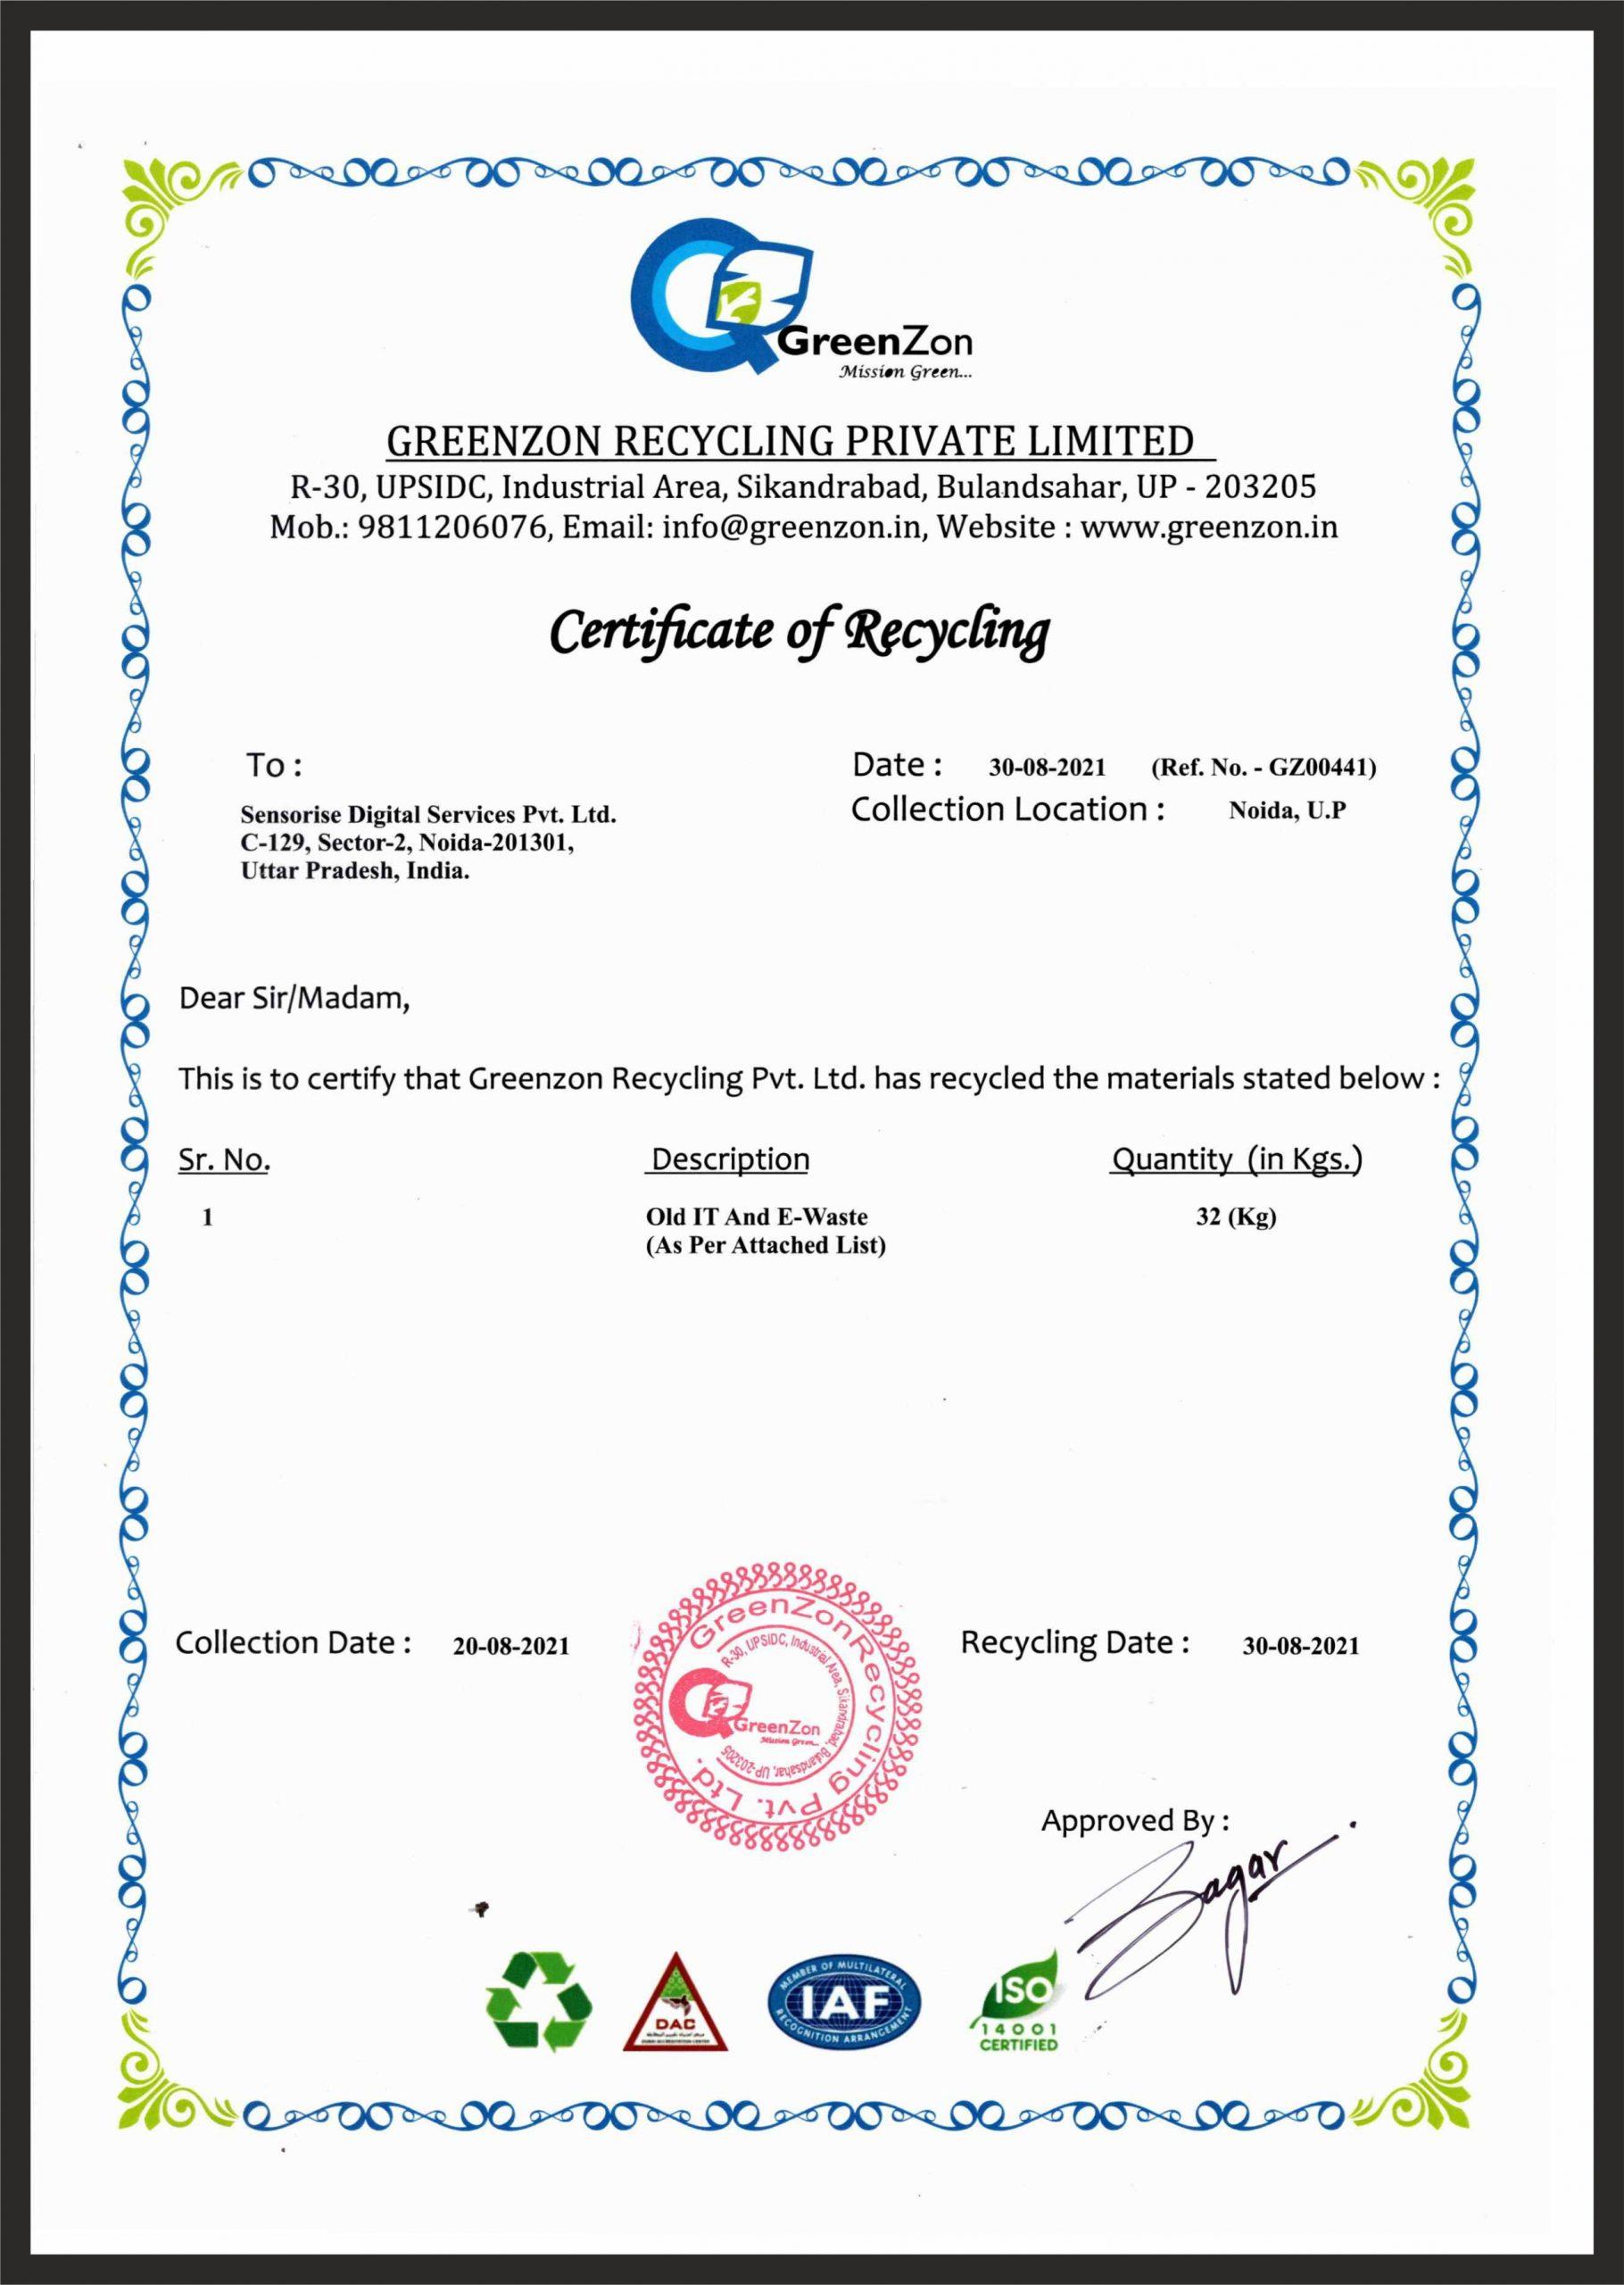 Sensorise recycling initiatives